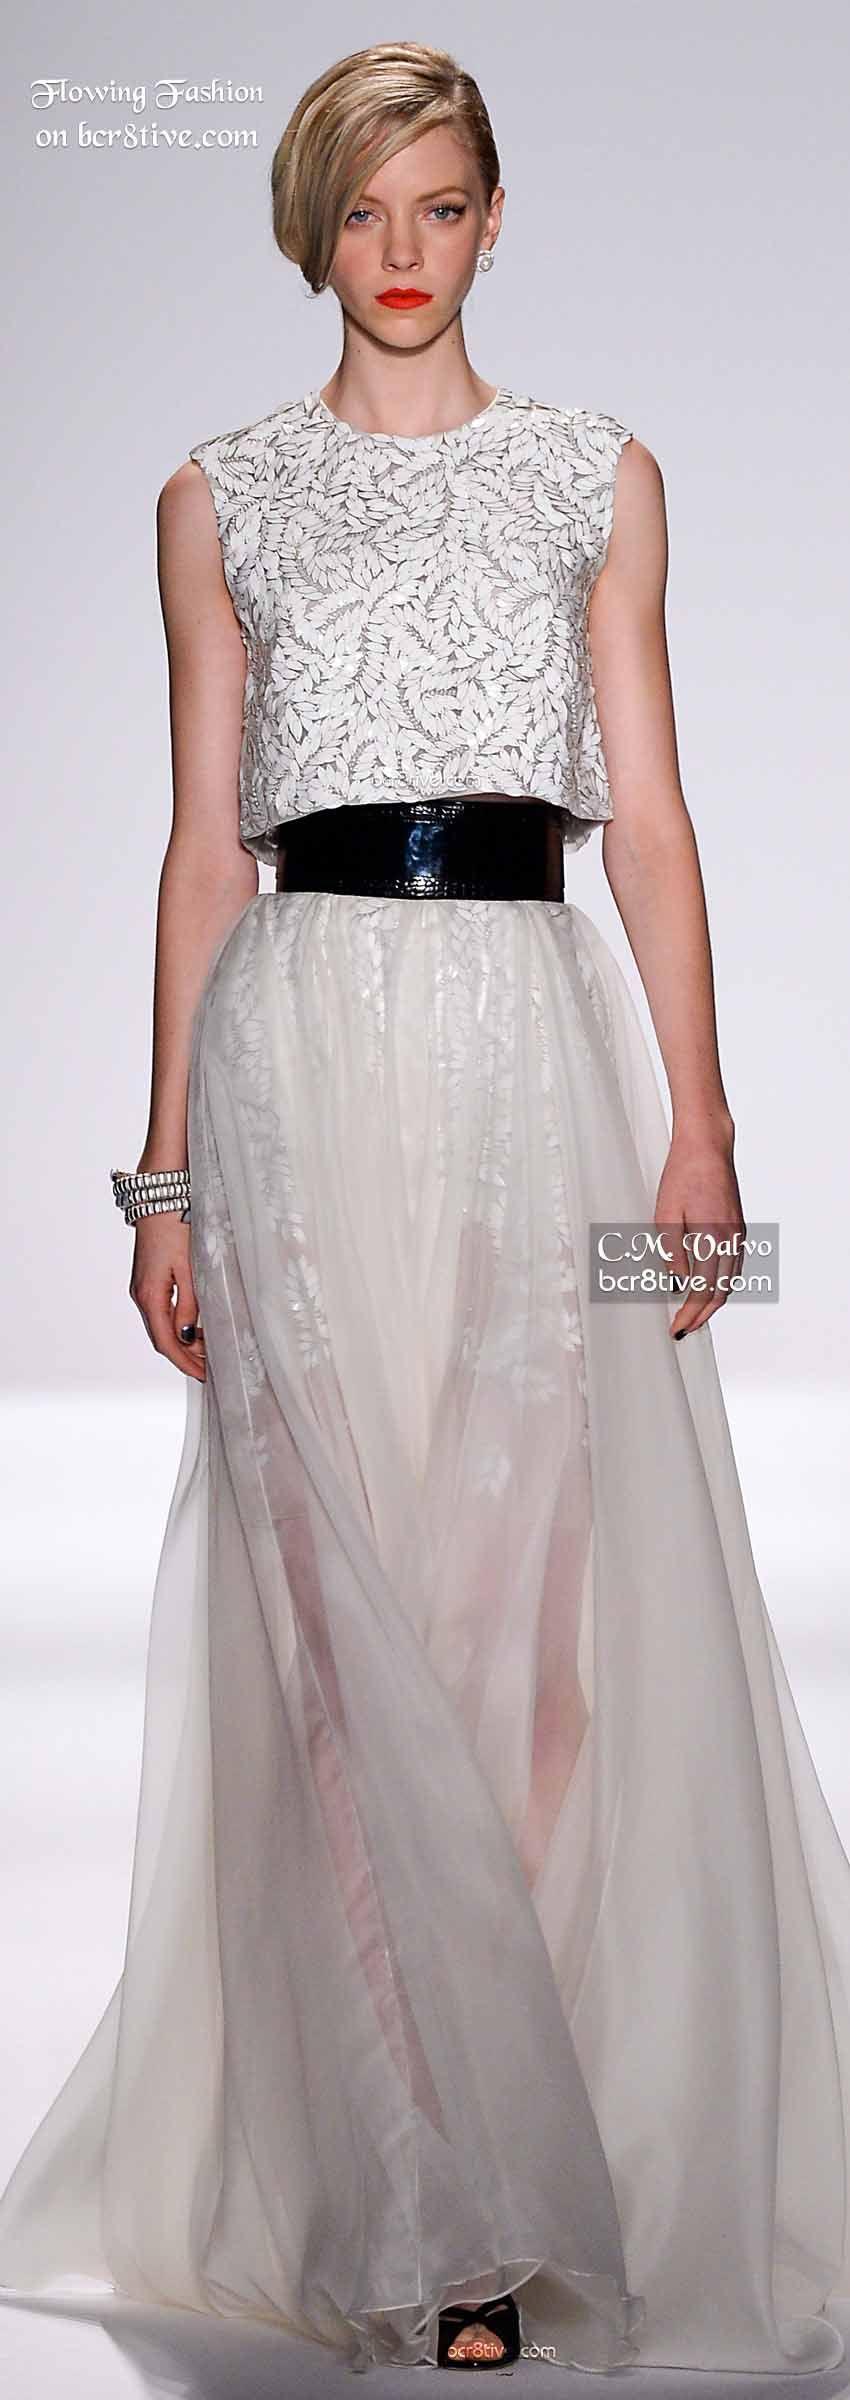 Flowing Fashion Spring Summer 2015 - Carmen Marc Valvo